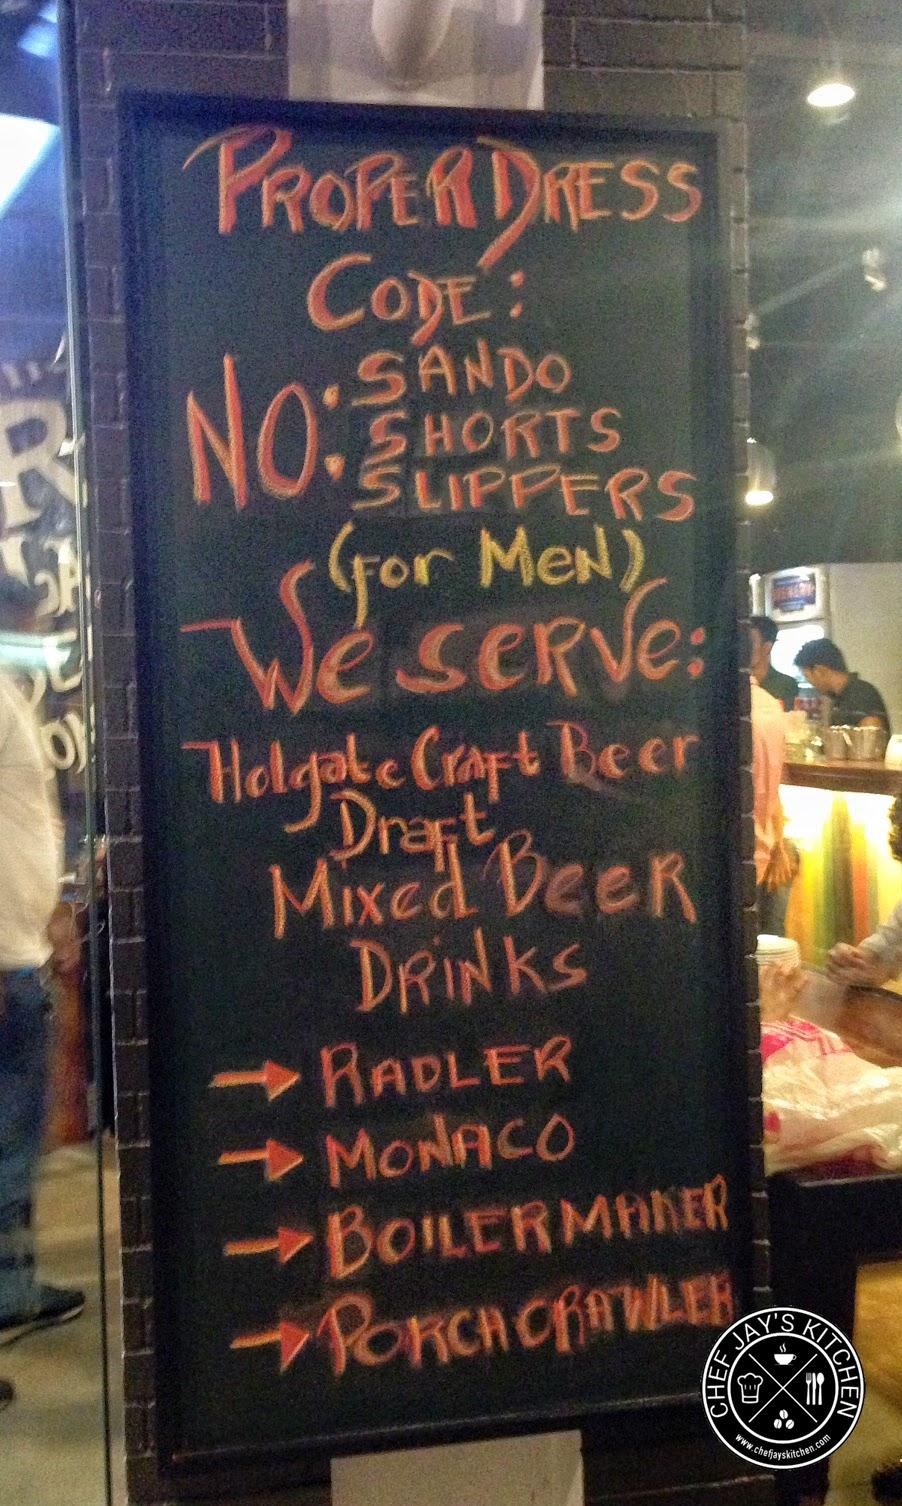 Brewery Gastropub Now Brewing in Iloilo City Dress Code